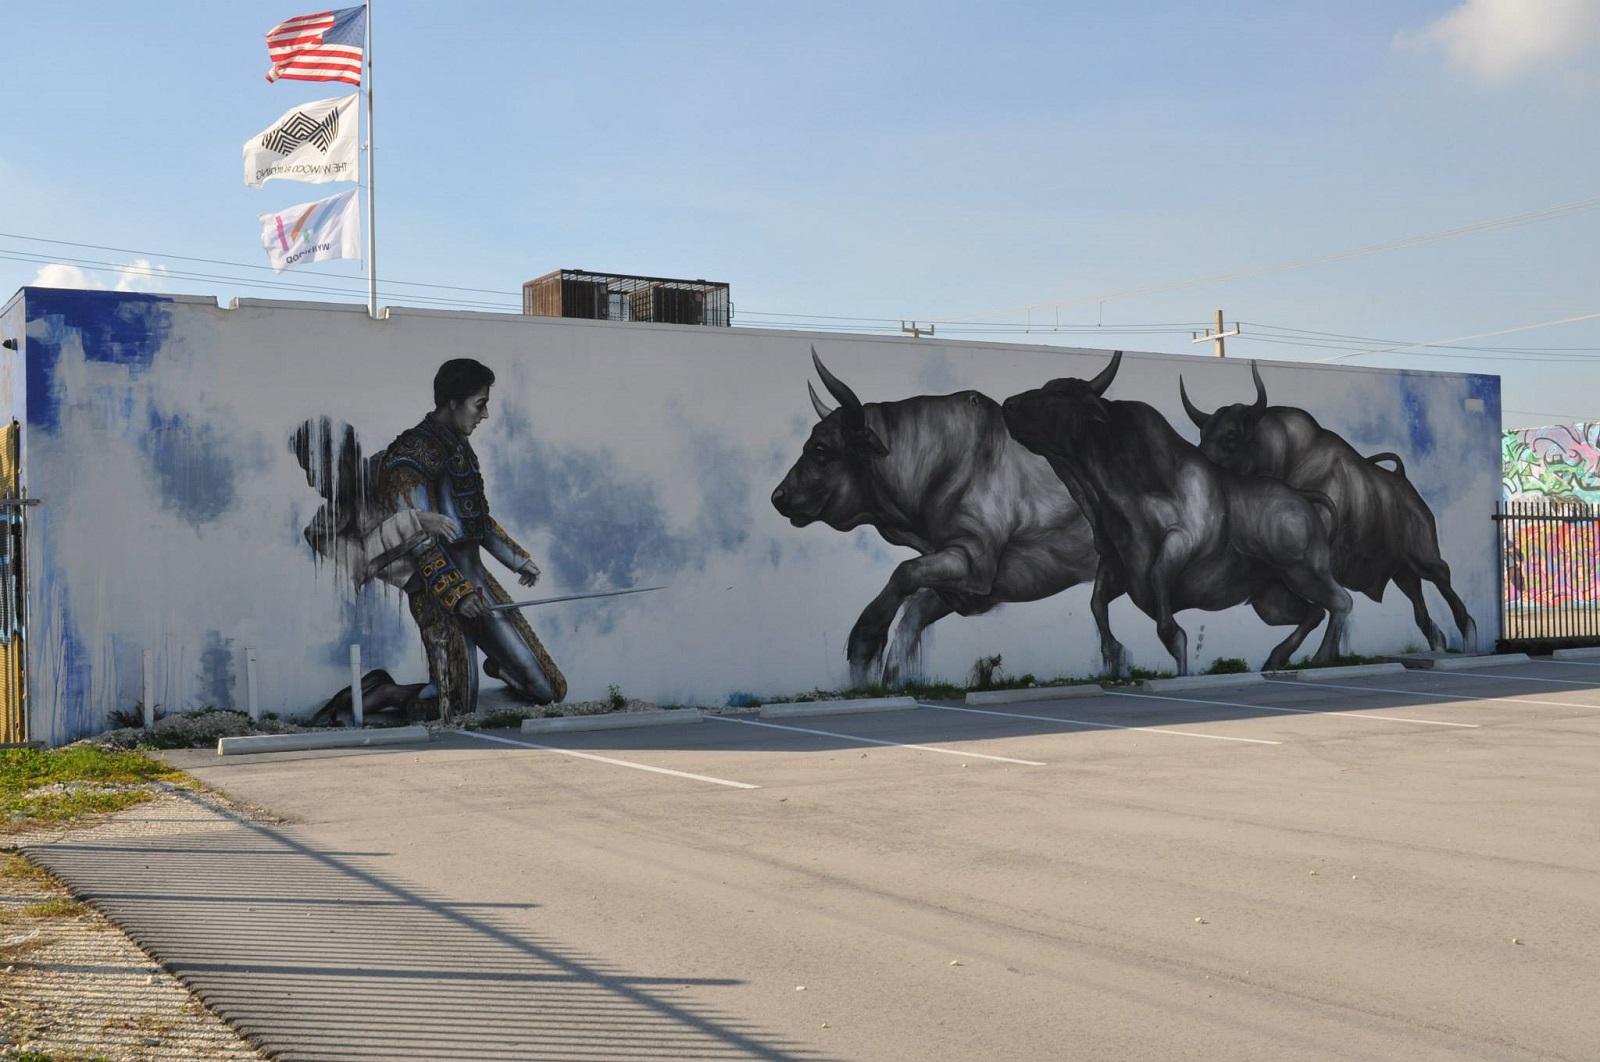 evoca1-new-mural-at-art-basel-2014-01